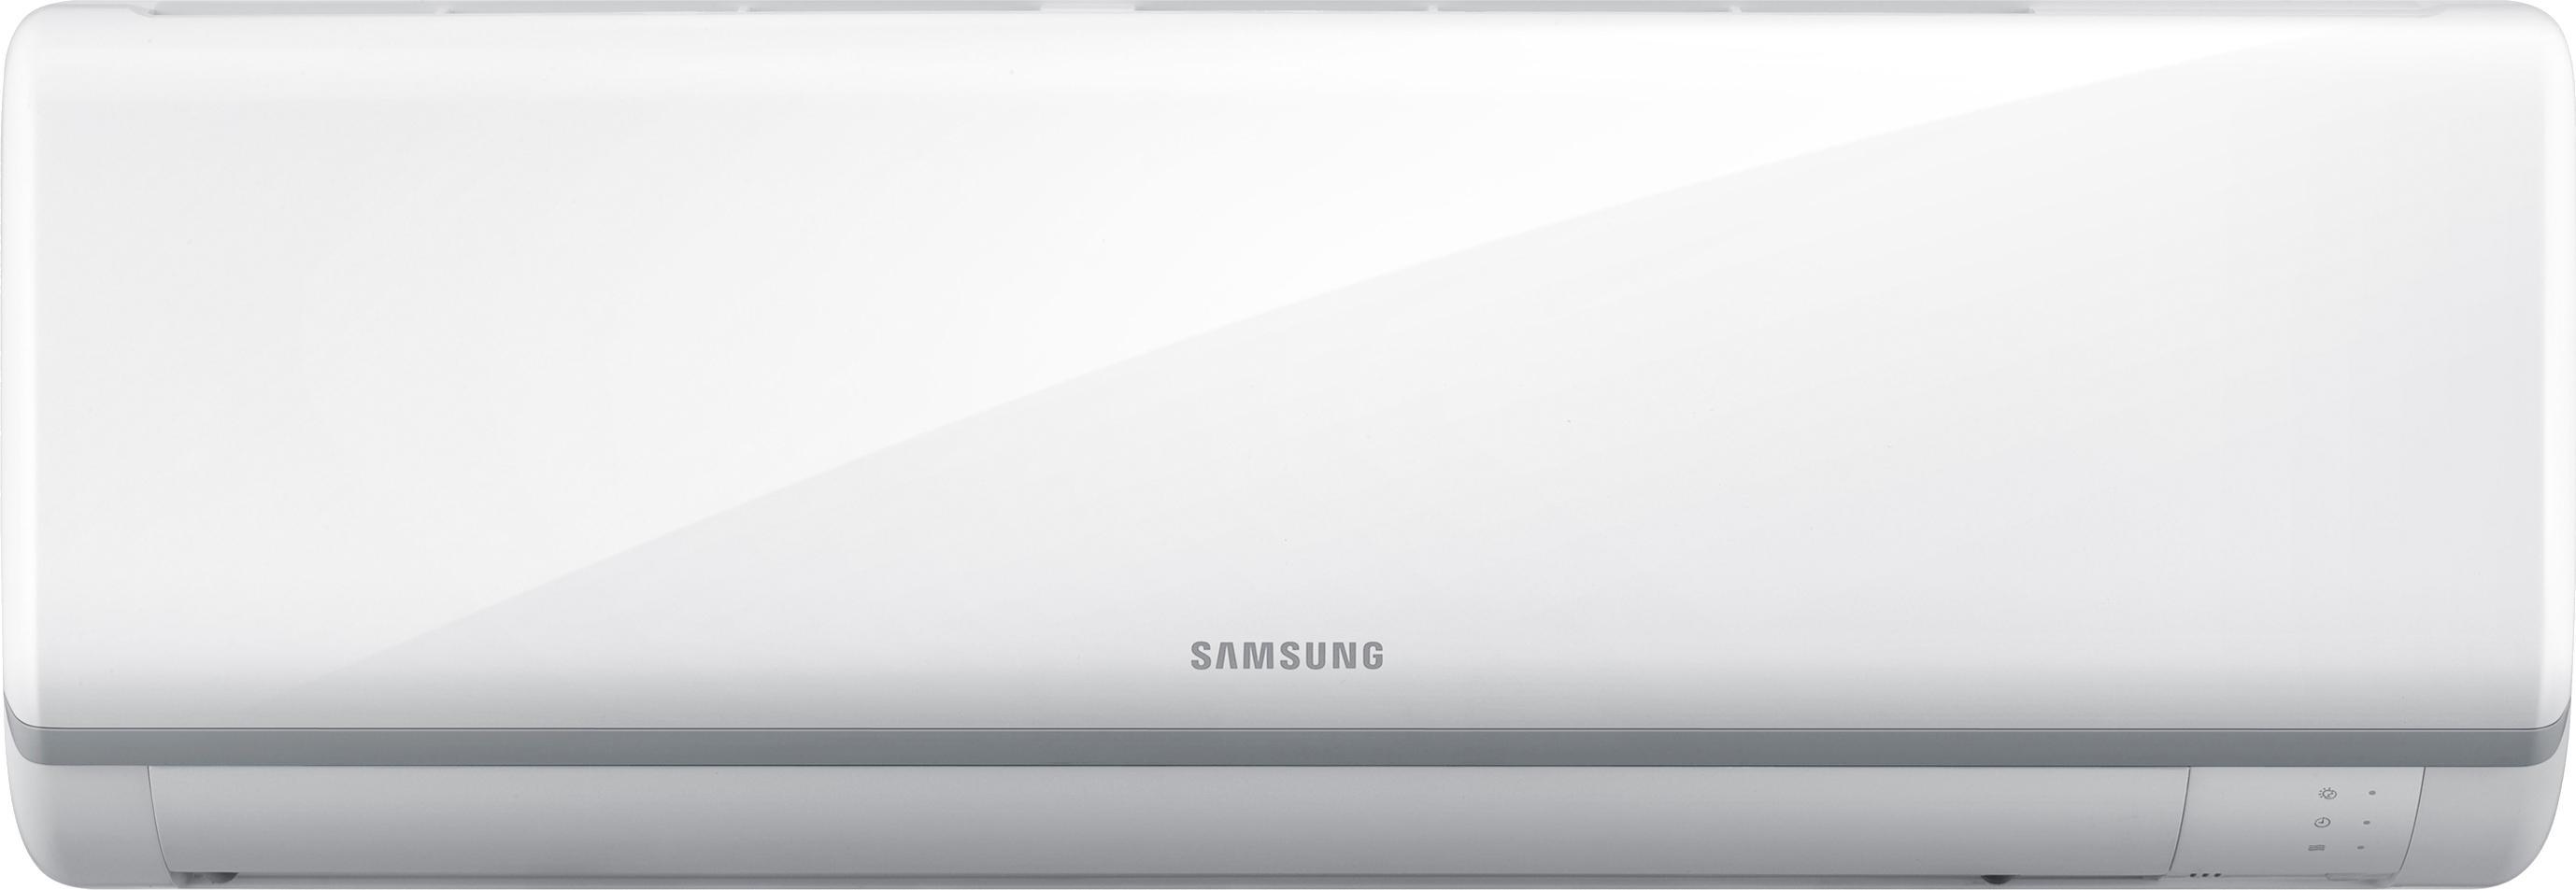 Samsung AQ18TSL